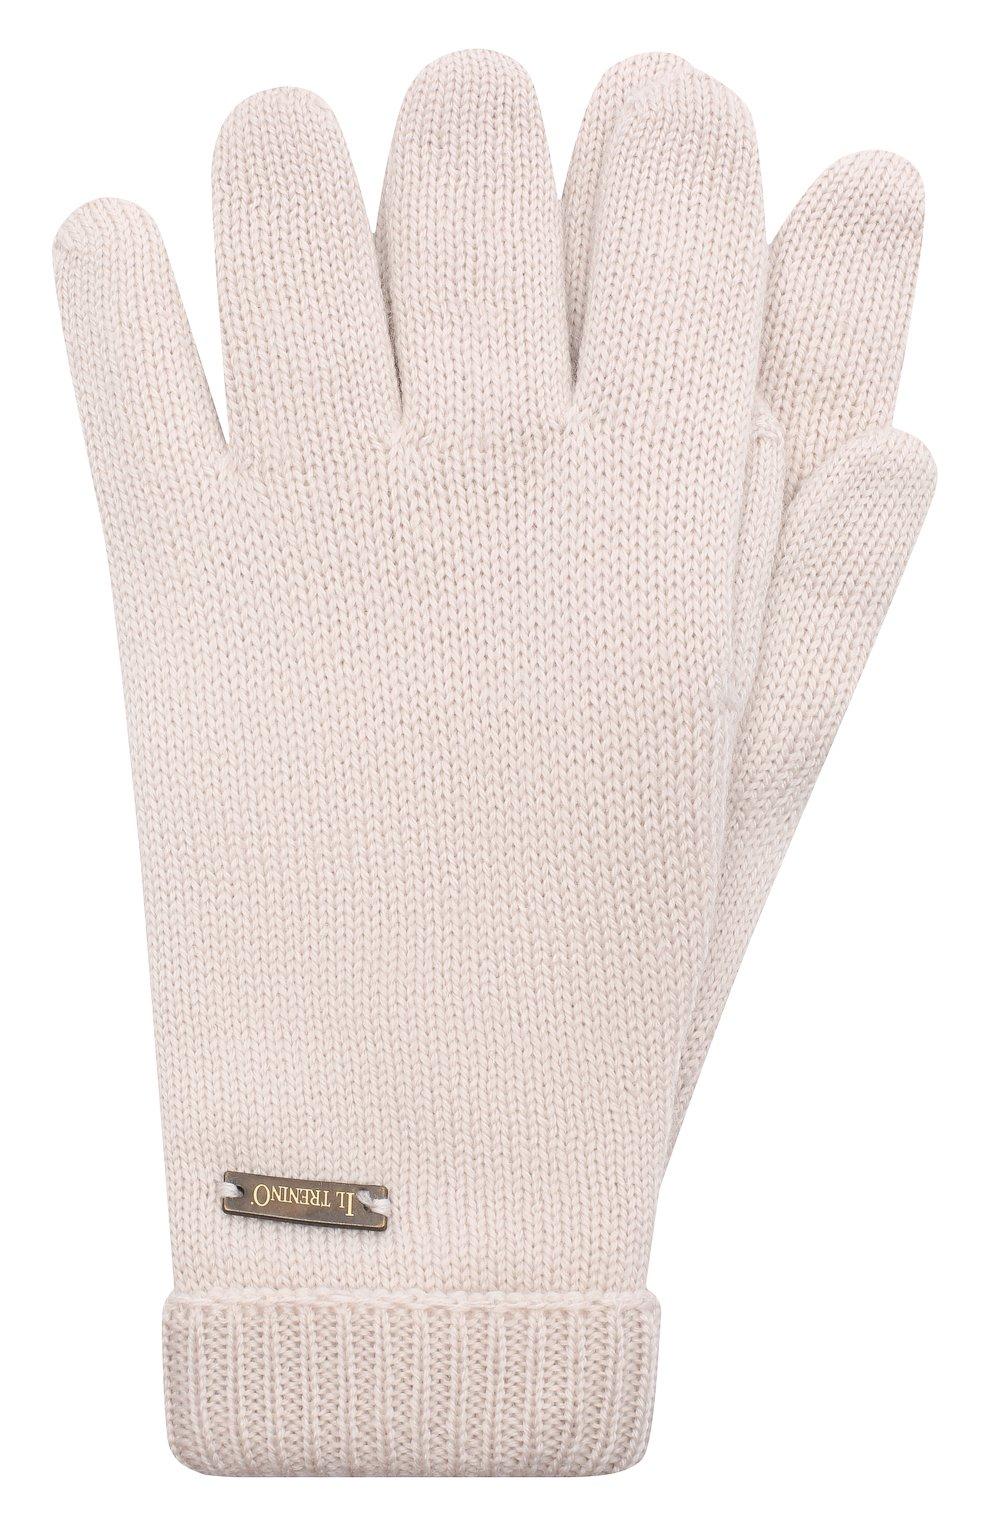 Детские шерстяные перчатки IL TRENINO бежевого цвета, арт. 20 4063/E0 | Фото 1